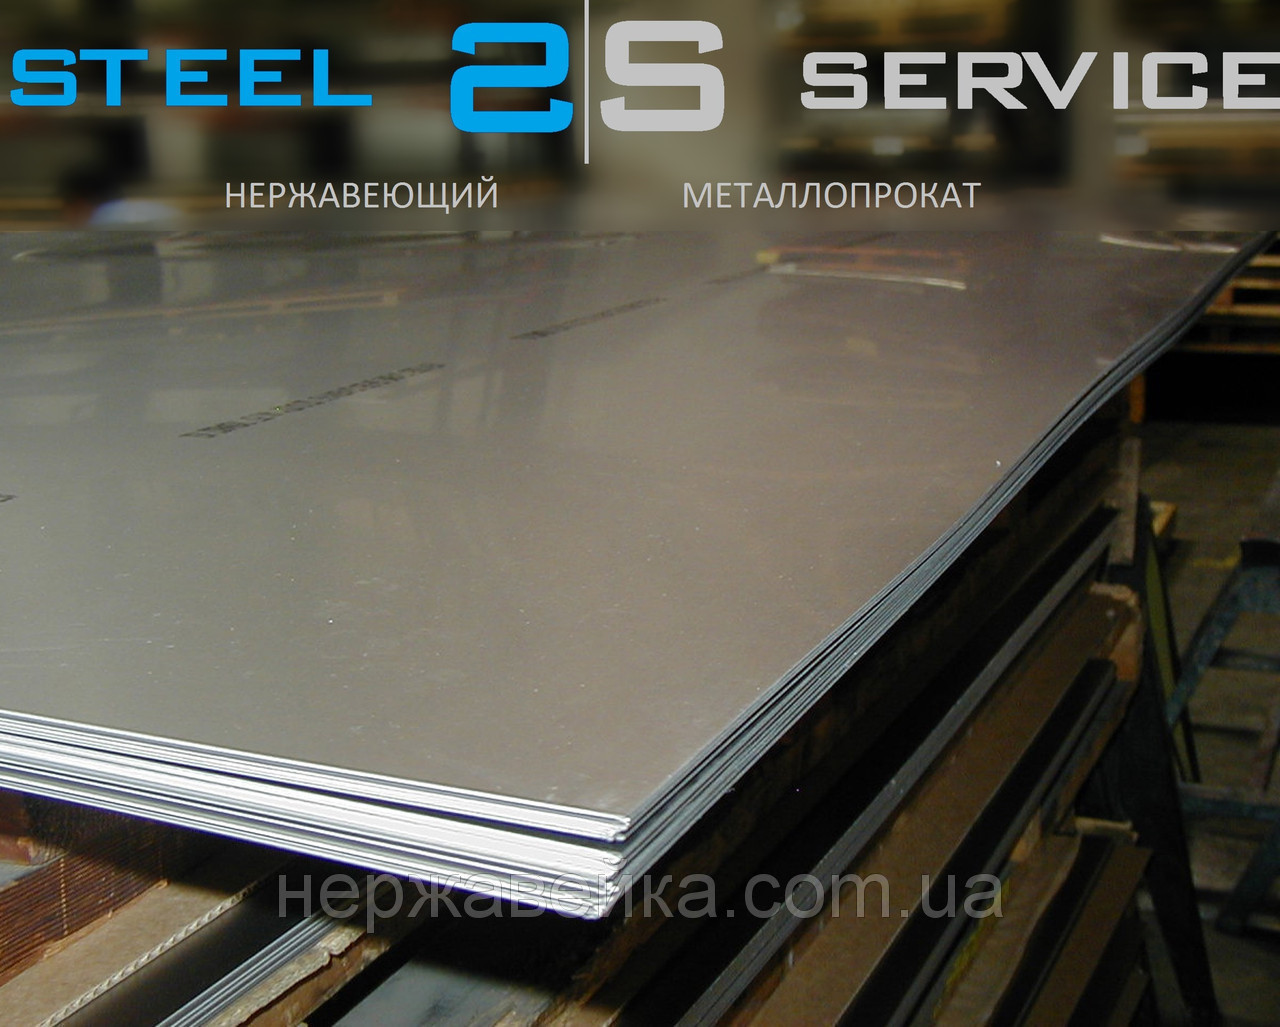 Нержавейка лист 0,4х1250х2500мм AISI 430(12Х17) 2B - матовый, технический